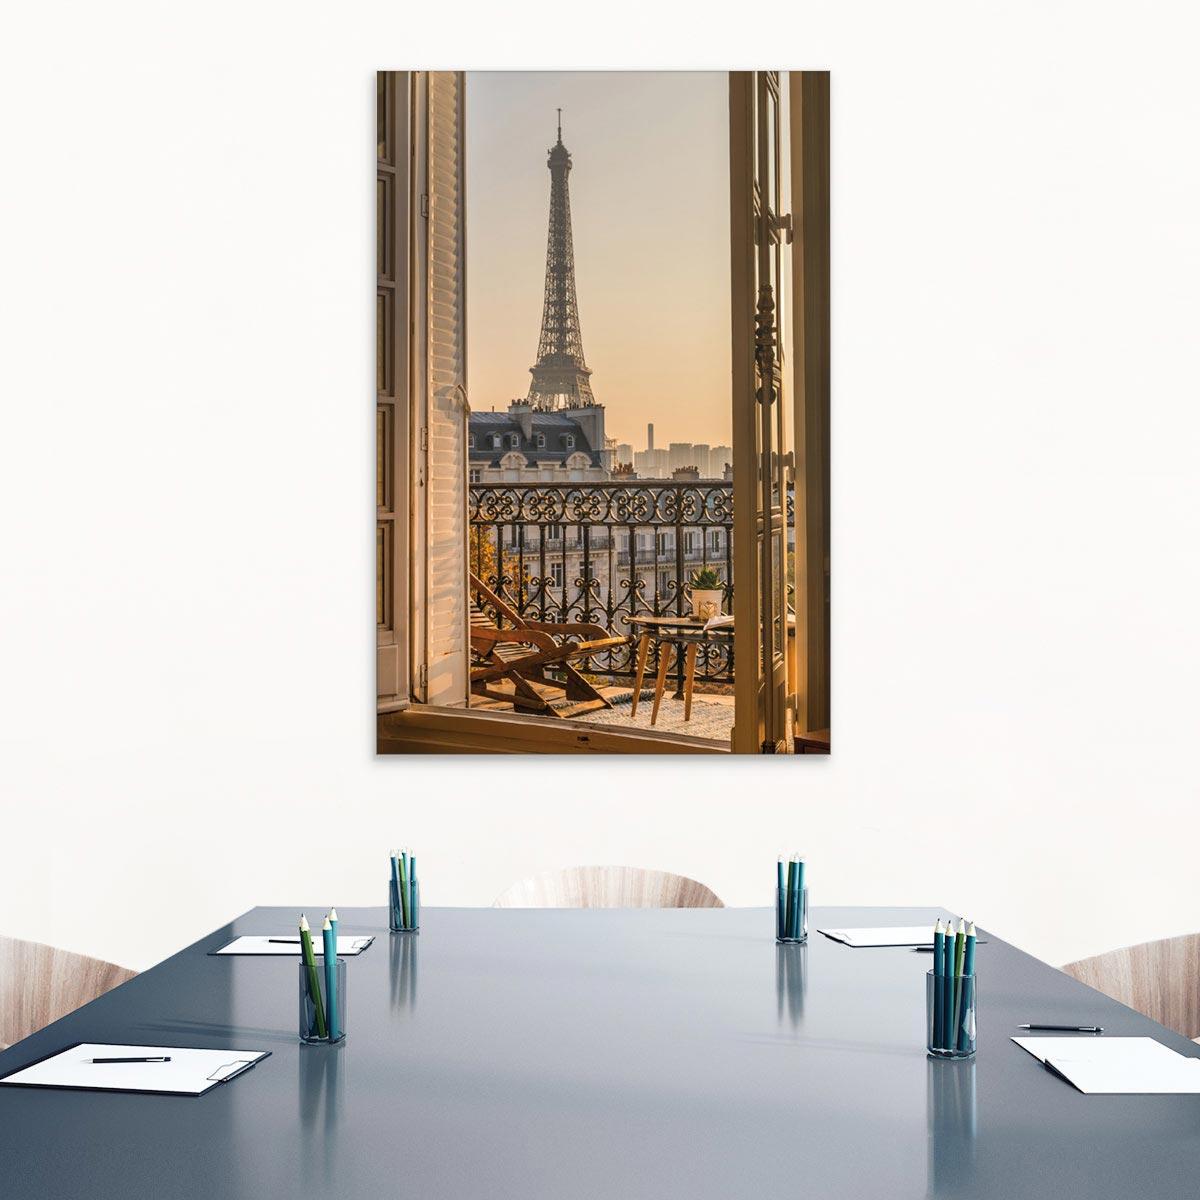 Akustikbild Paris, Eiffelturm, Frankreich